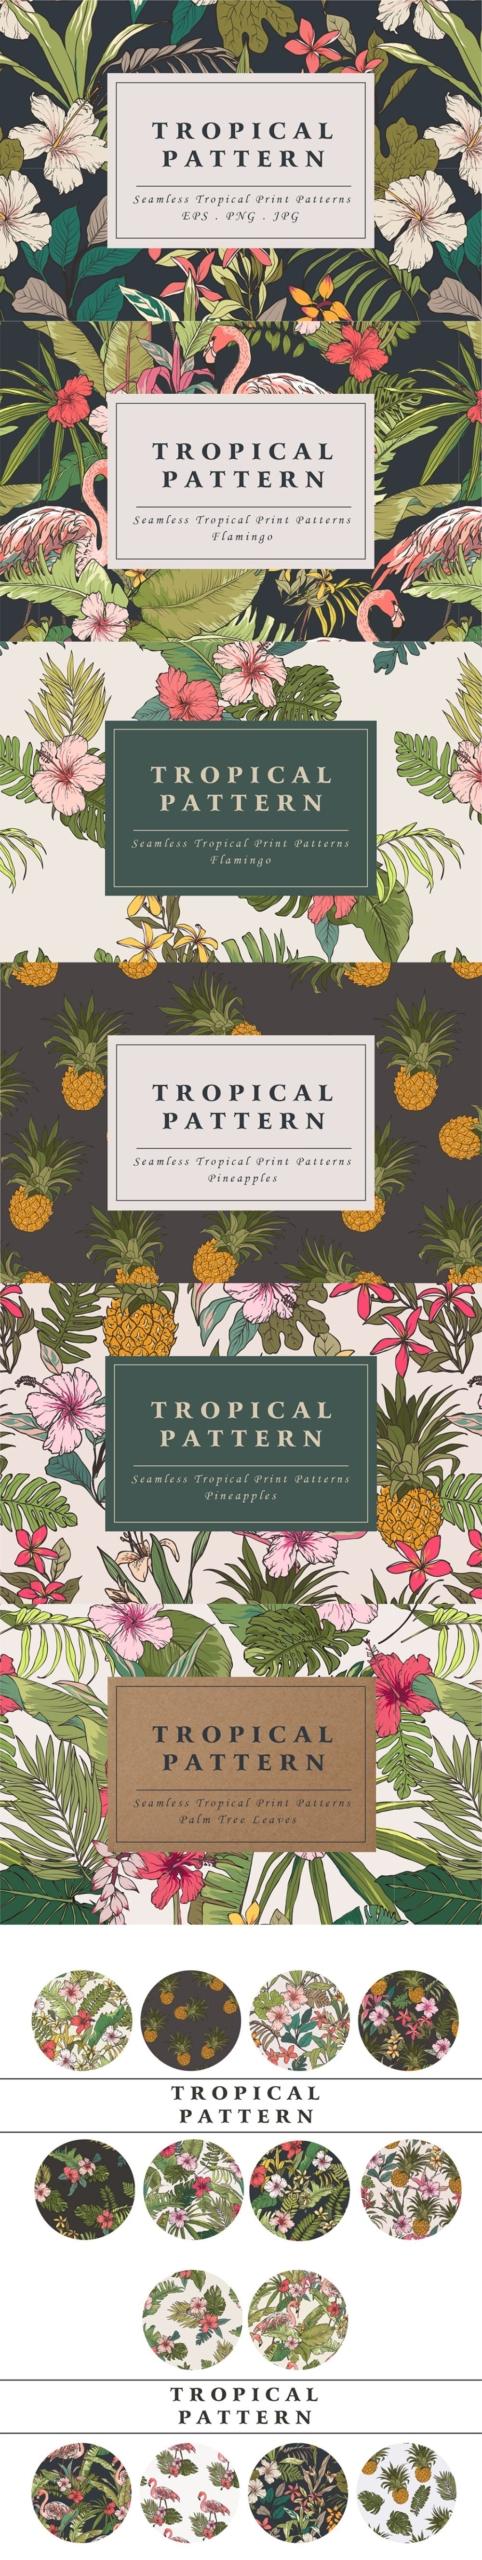 Tropical Flower Patterns